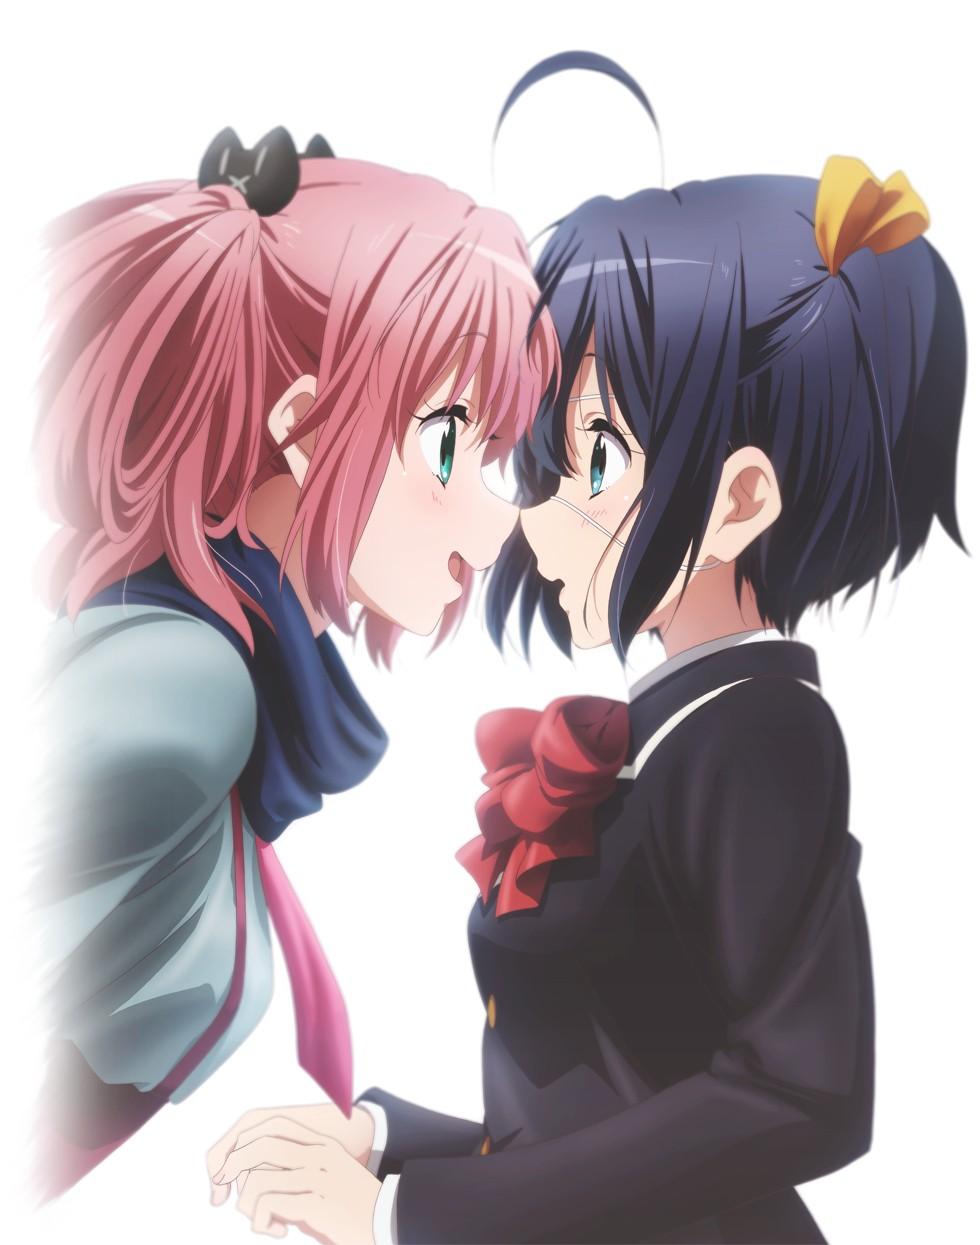 Чудачество любви не помеха! 2 сезон /Я не от мира сего, но тоже любить хочу 2 сезон / Chuunibyou demo Koi ga Shitai! Ren